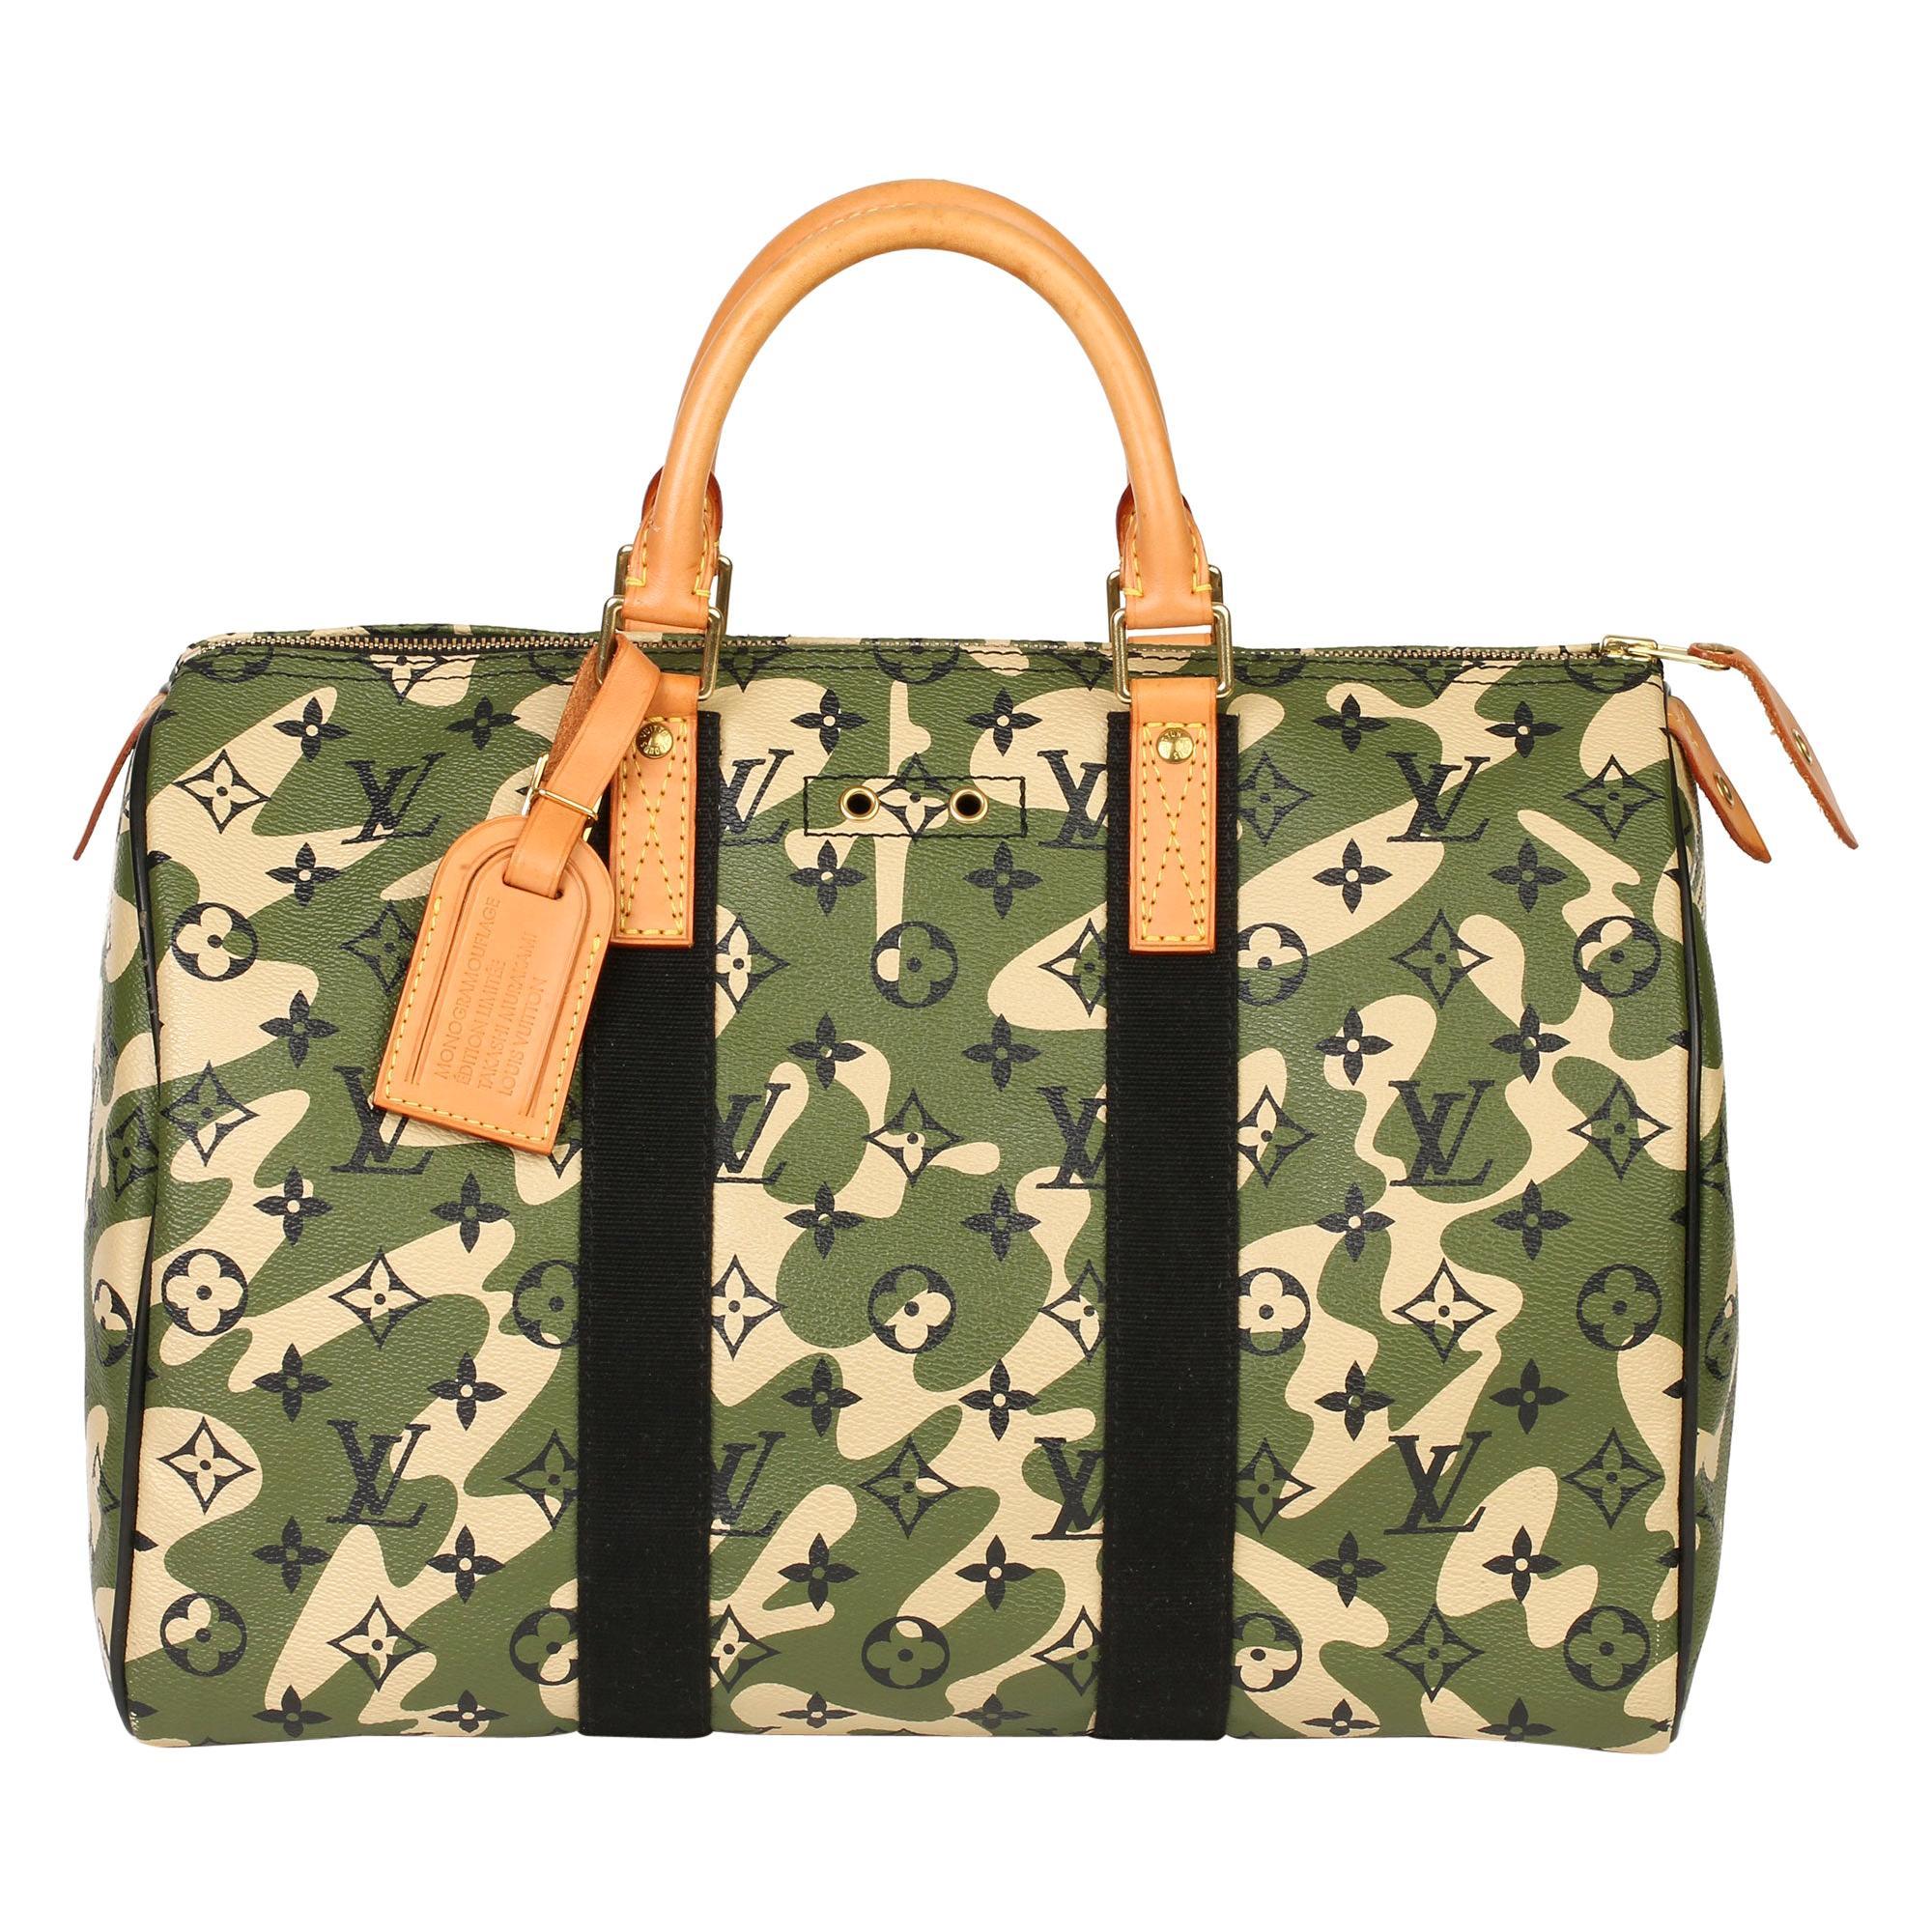 Louis Vuitton Green Monogramouflage Coated Canvas Murakami Speedy 35